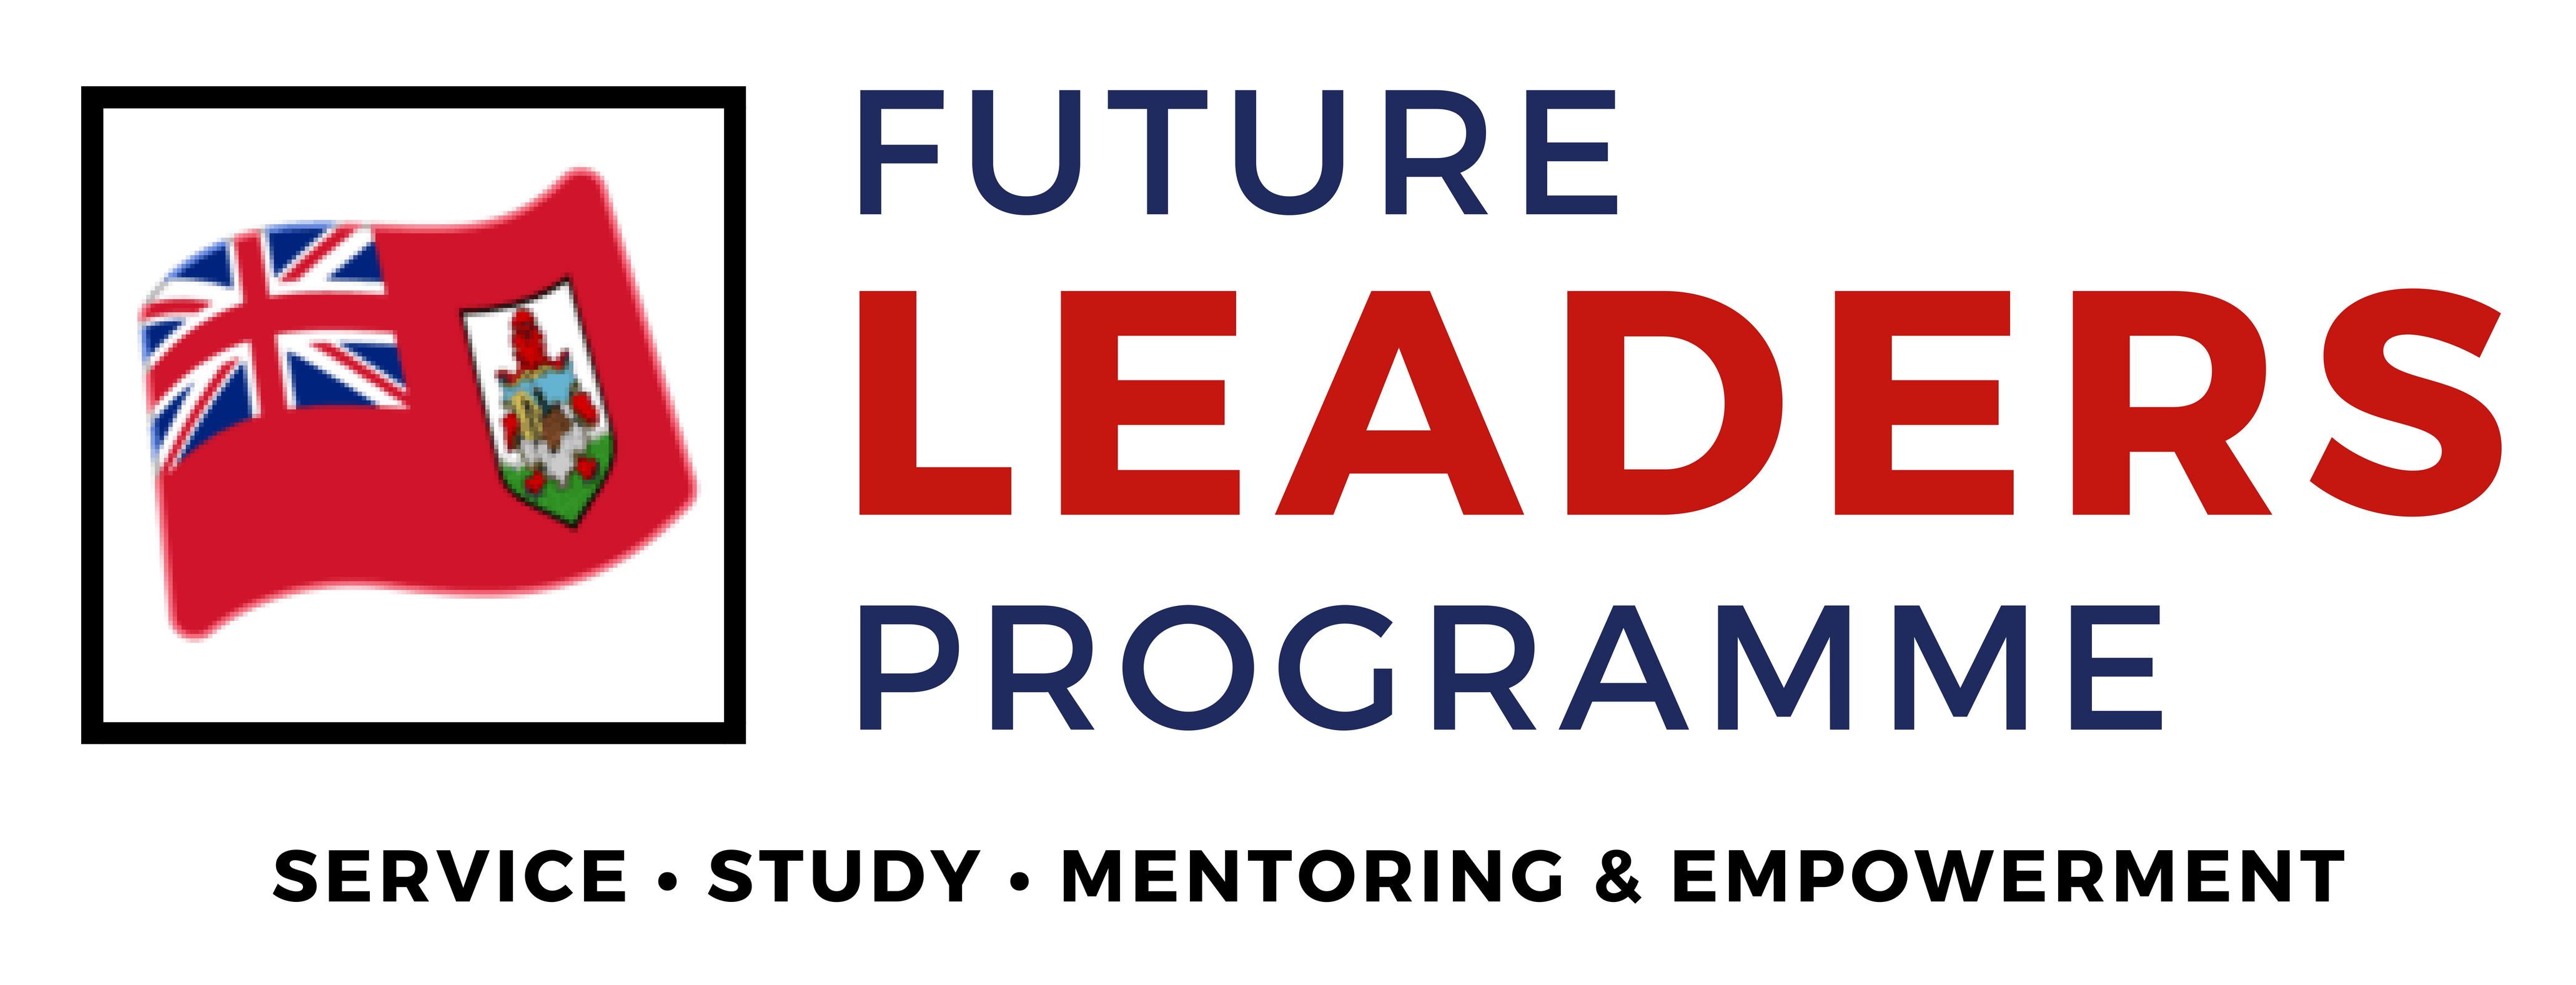 Future Leaders Programme